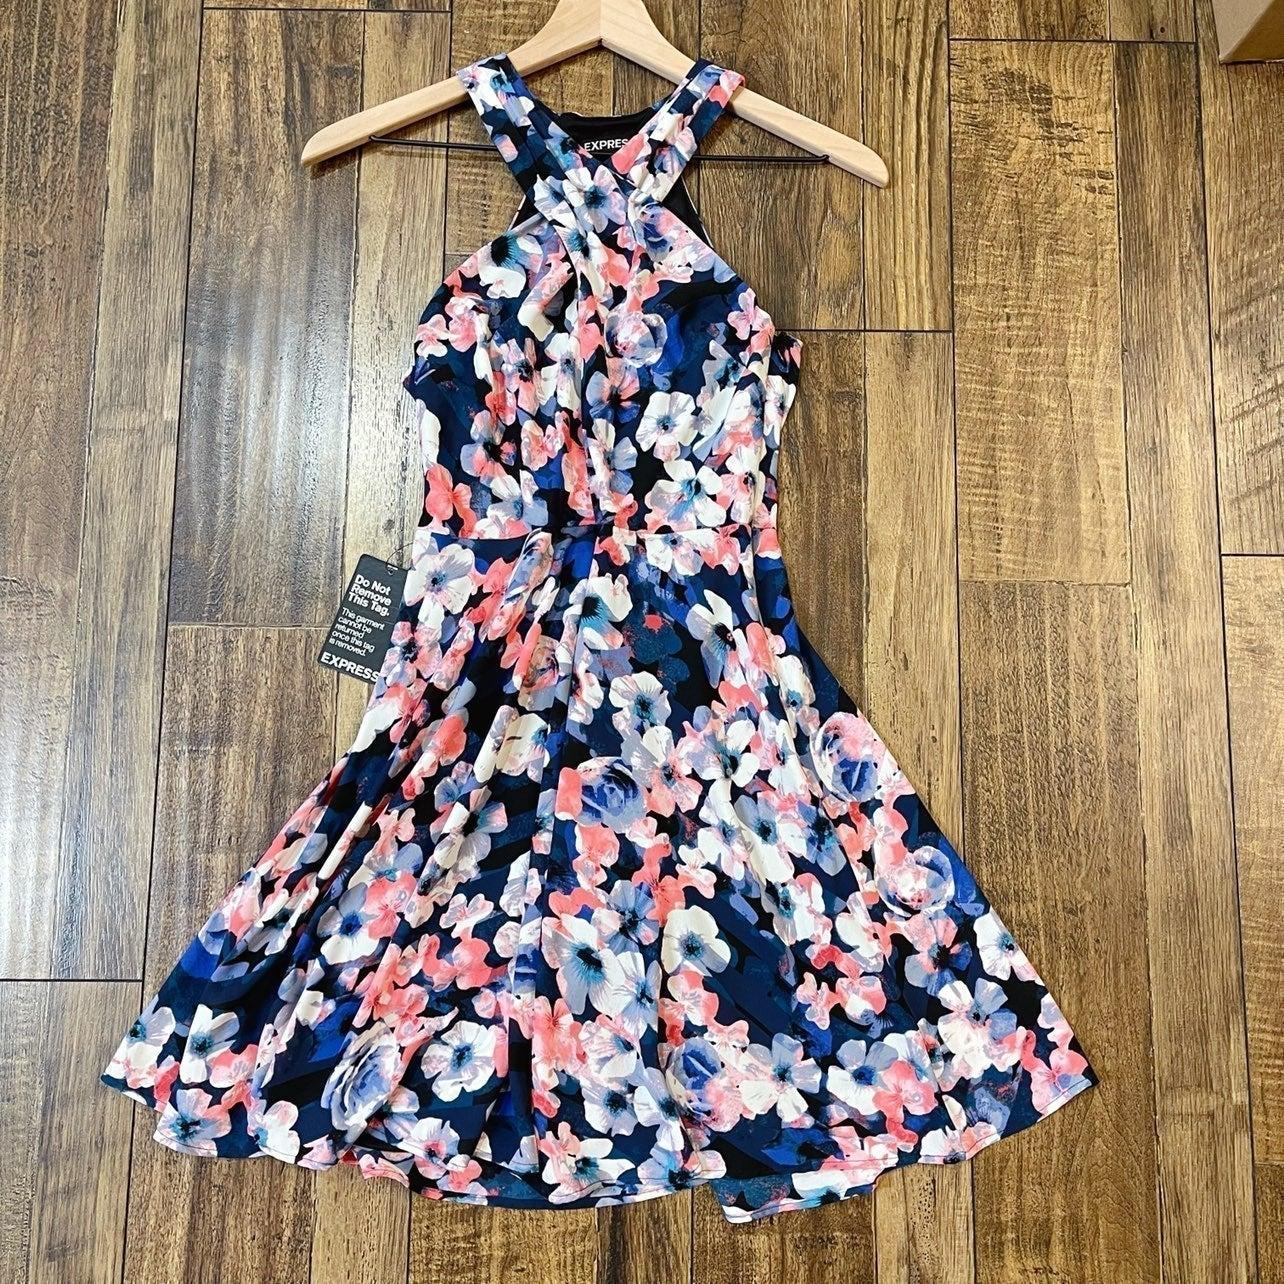 NWT Express Floral Dress eize 0